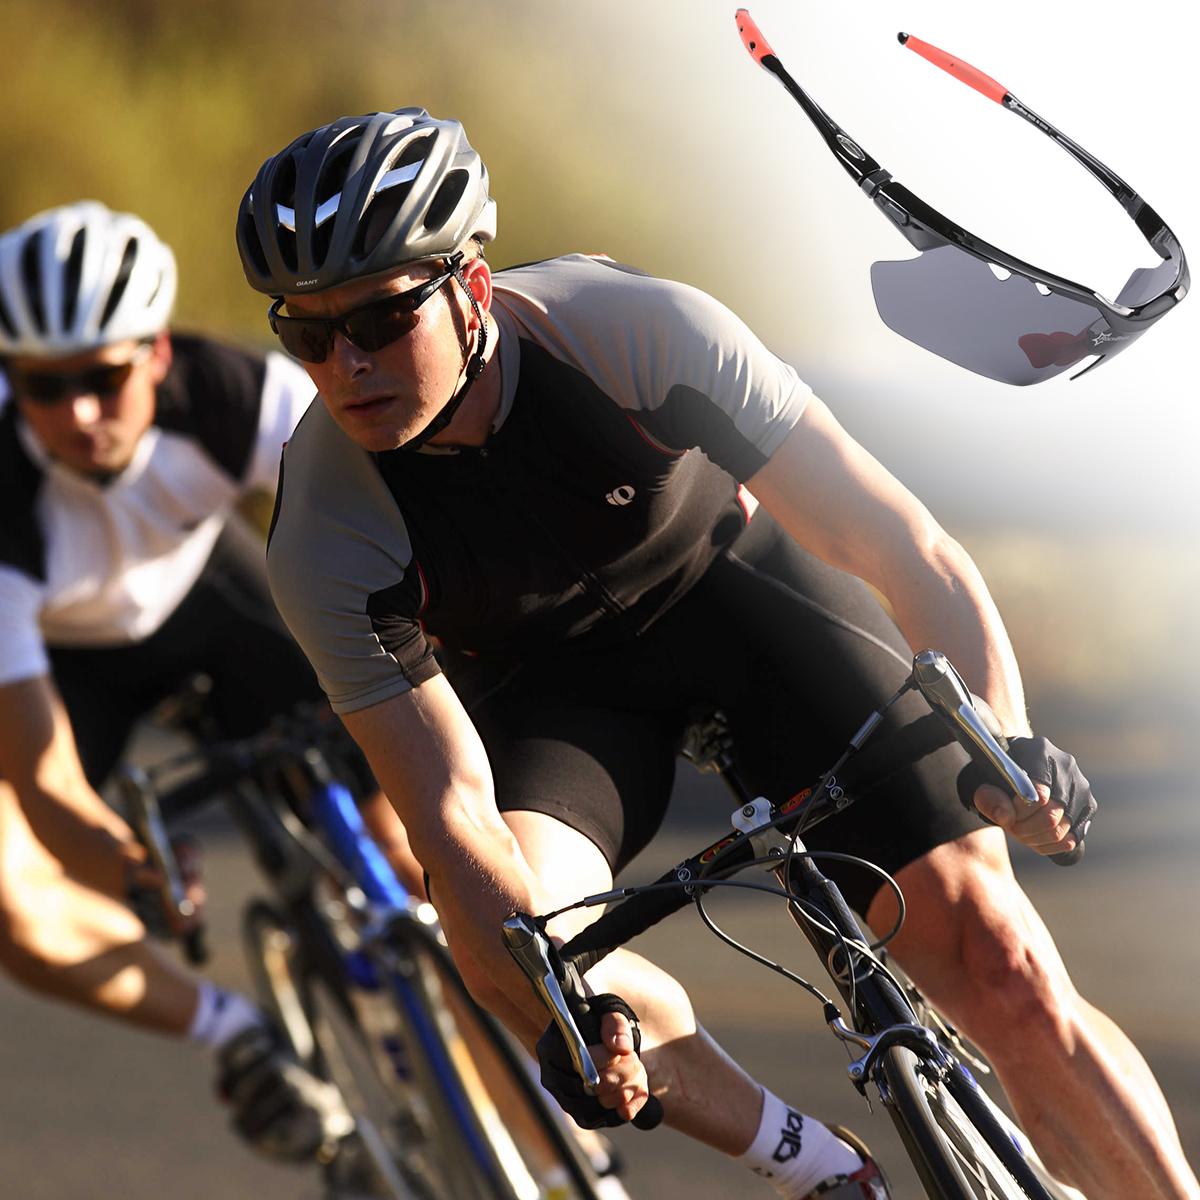 ROCKBROS MTB Cycling Sunglasses 1pair Polarized gafas ciclismo Bicycle Bike Glasses Sunglasses for men Eyewear CS111(China (Mainland))